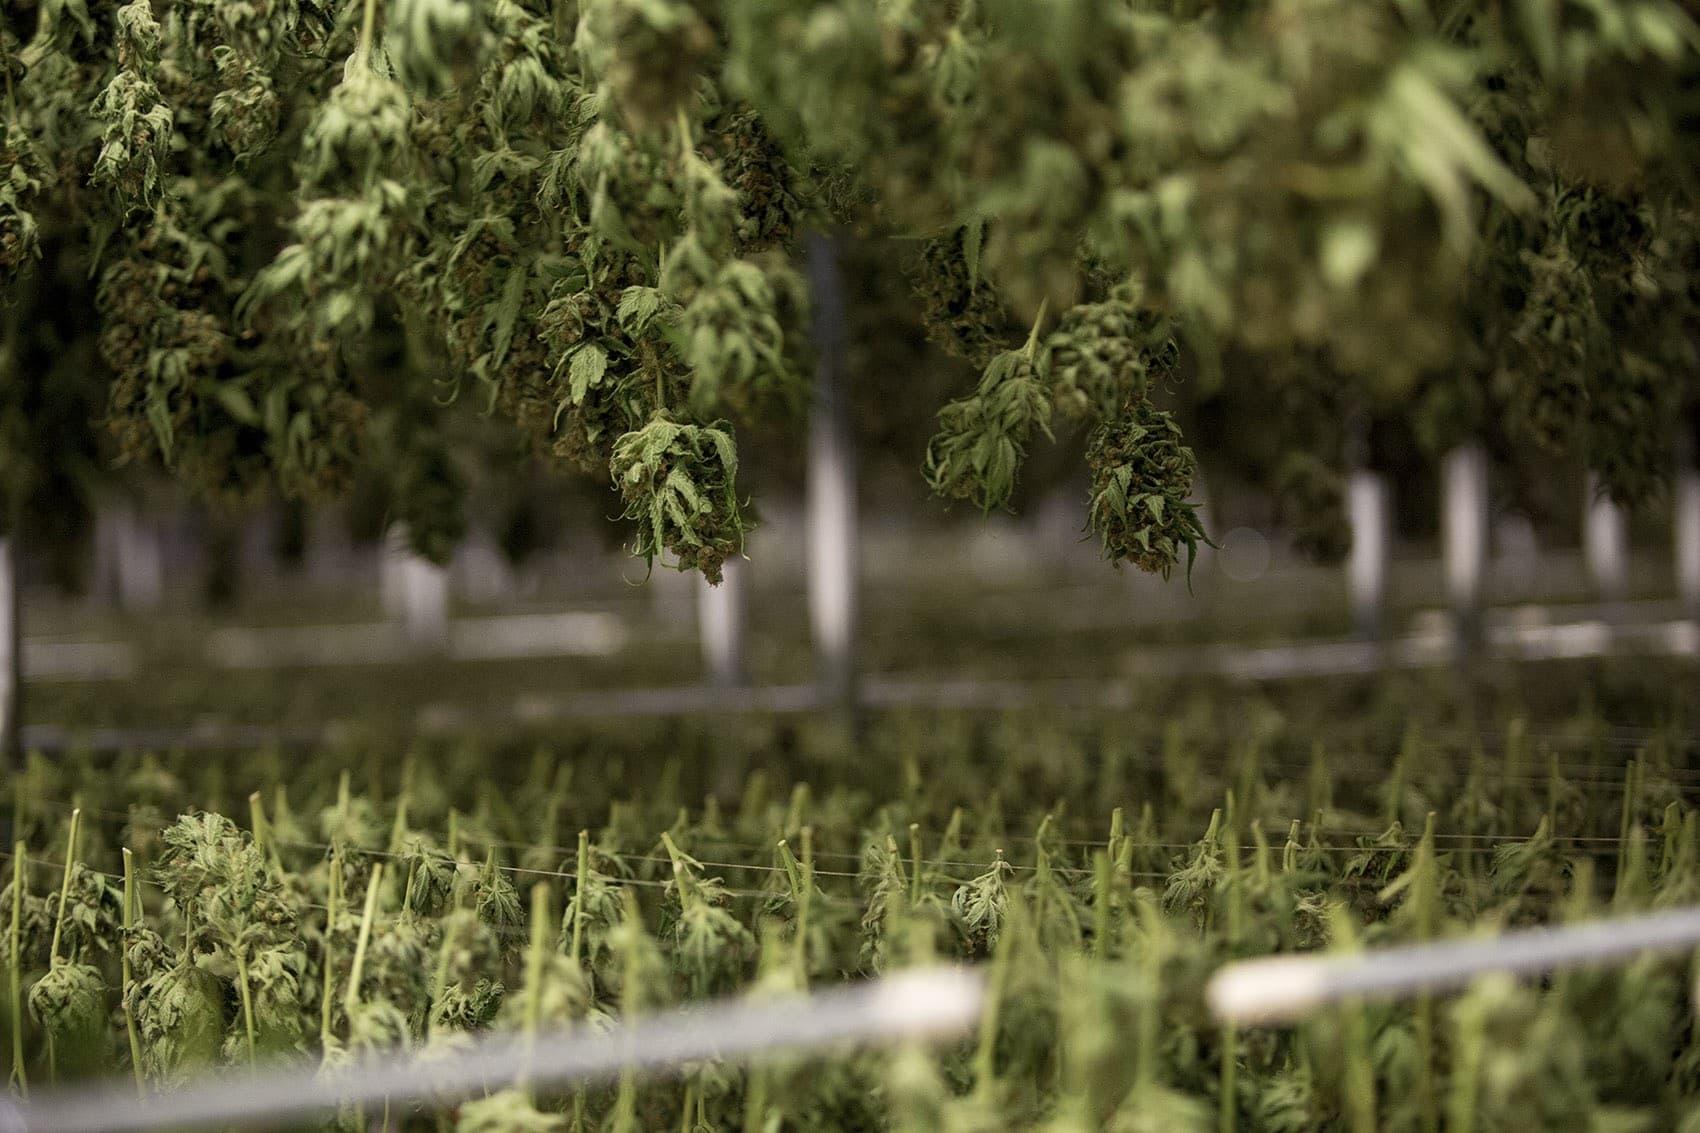 Harvested marijuana plants. (Jesse Costa/WBUR)